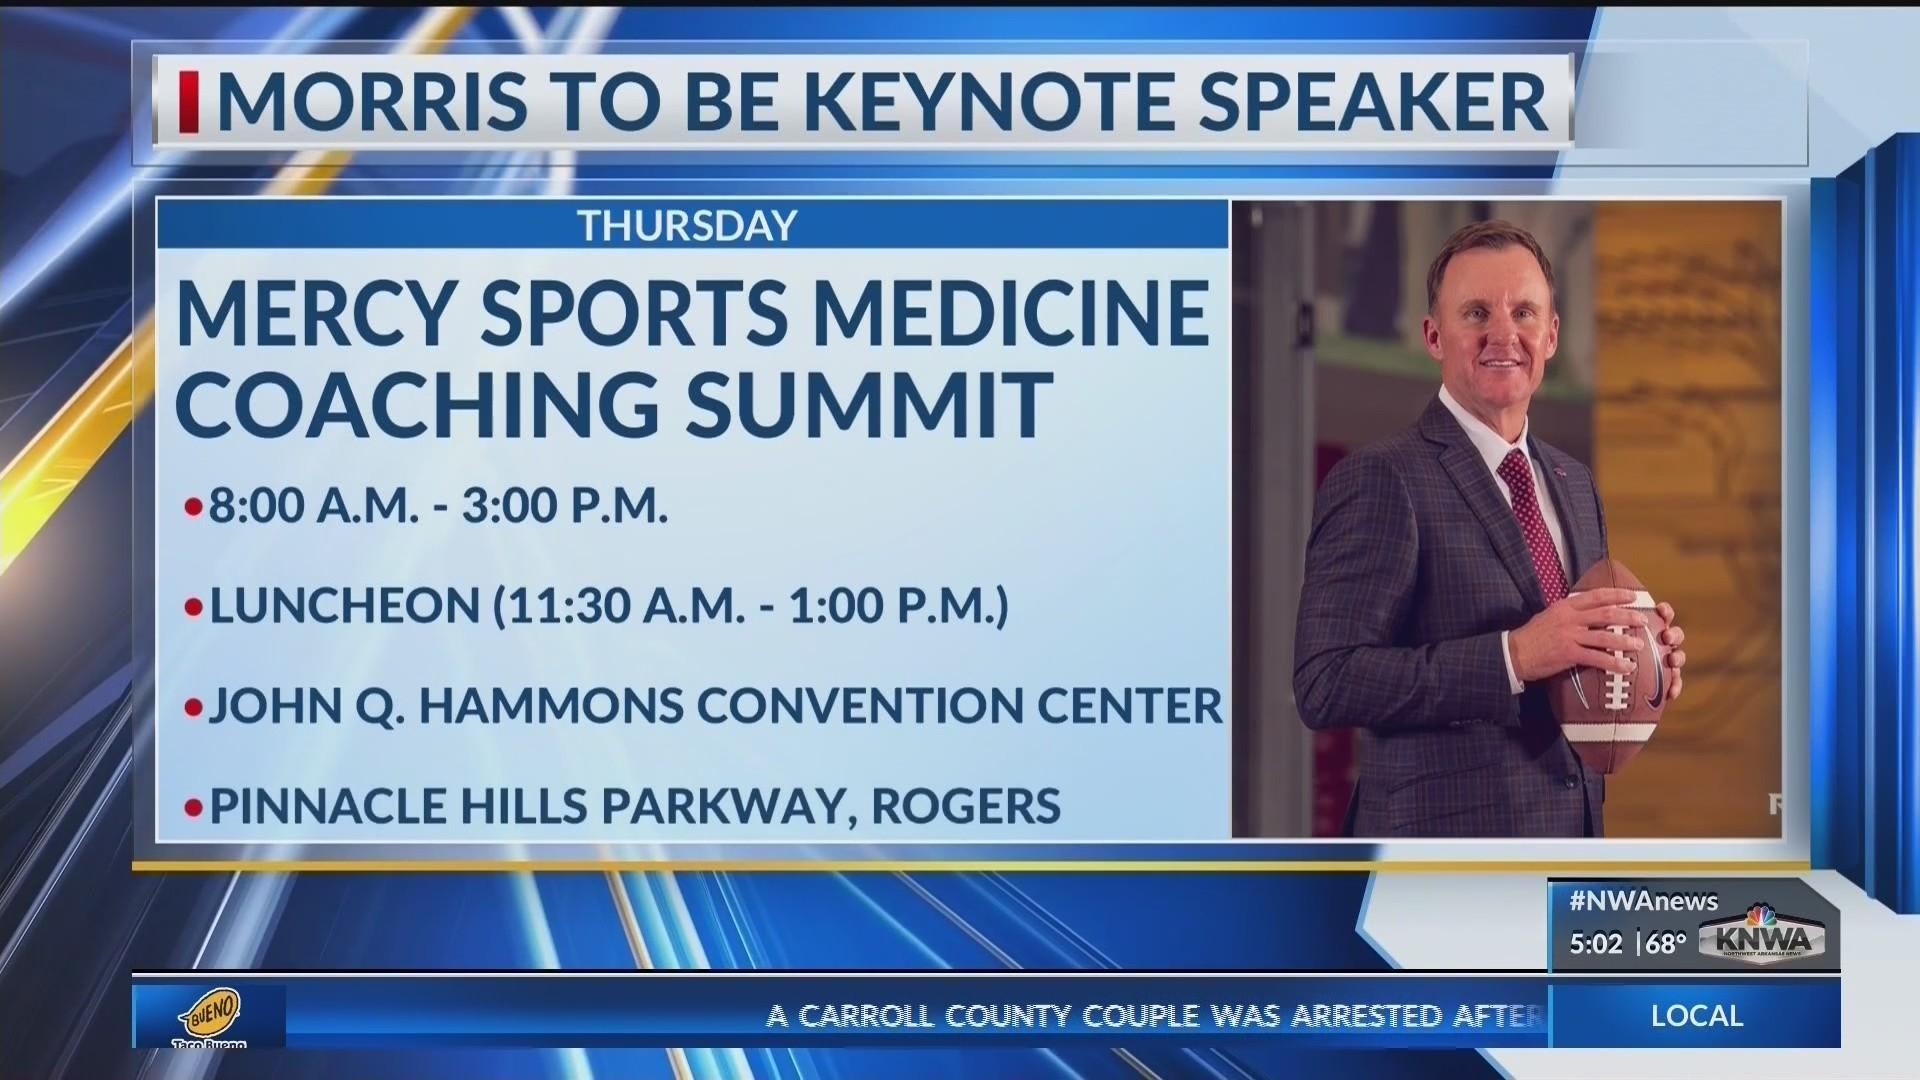 Mercy_Sports_Medicine_Coaching_Summit_Be_0_20180726110723